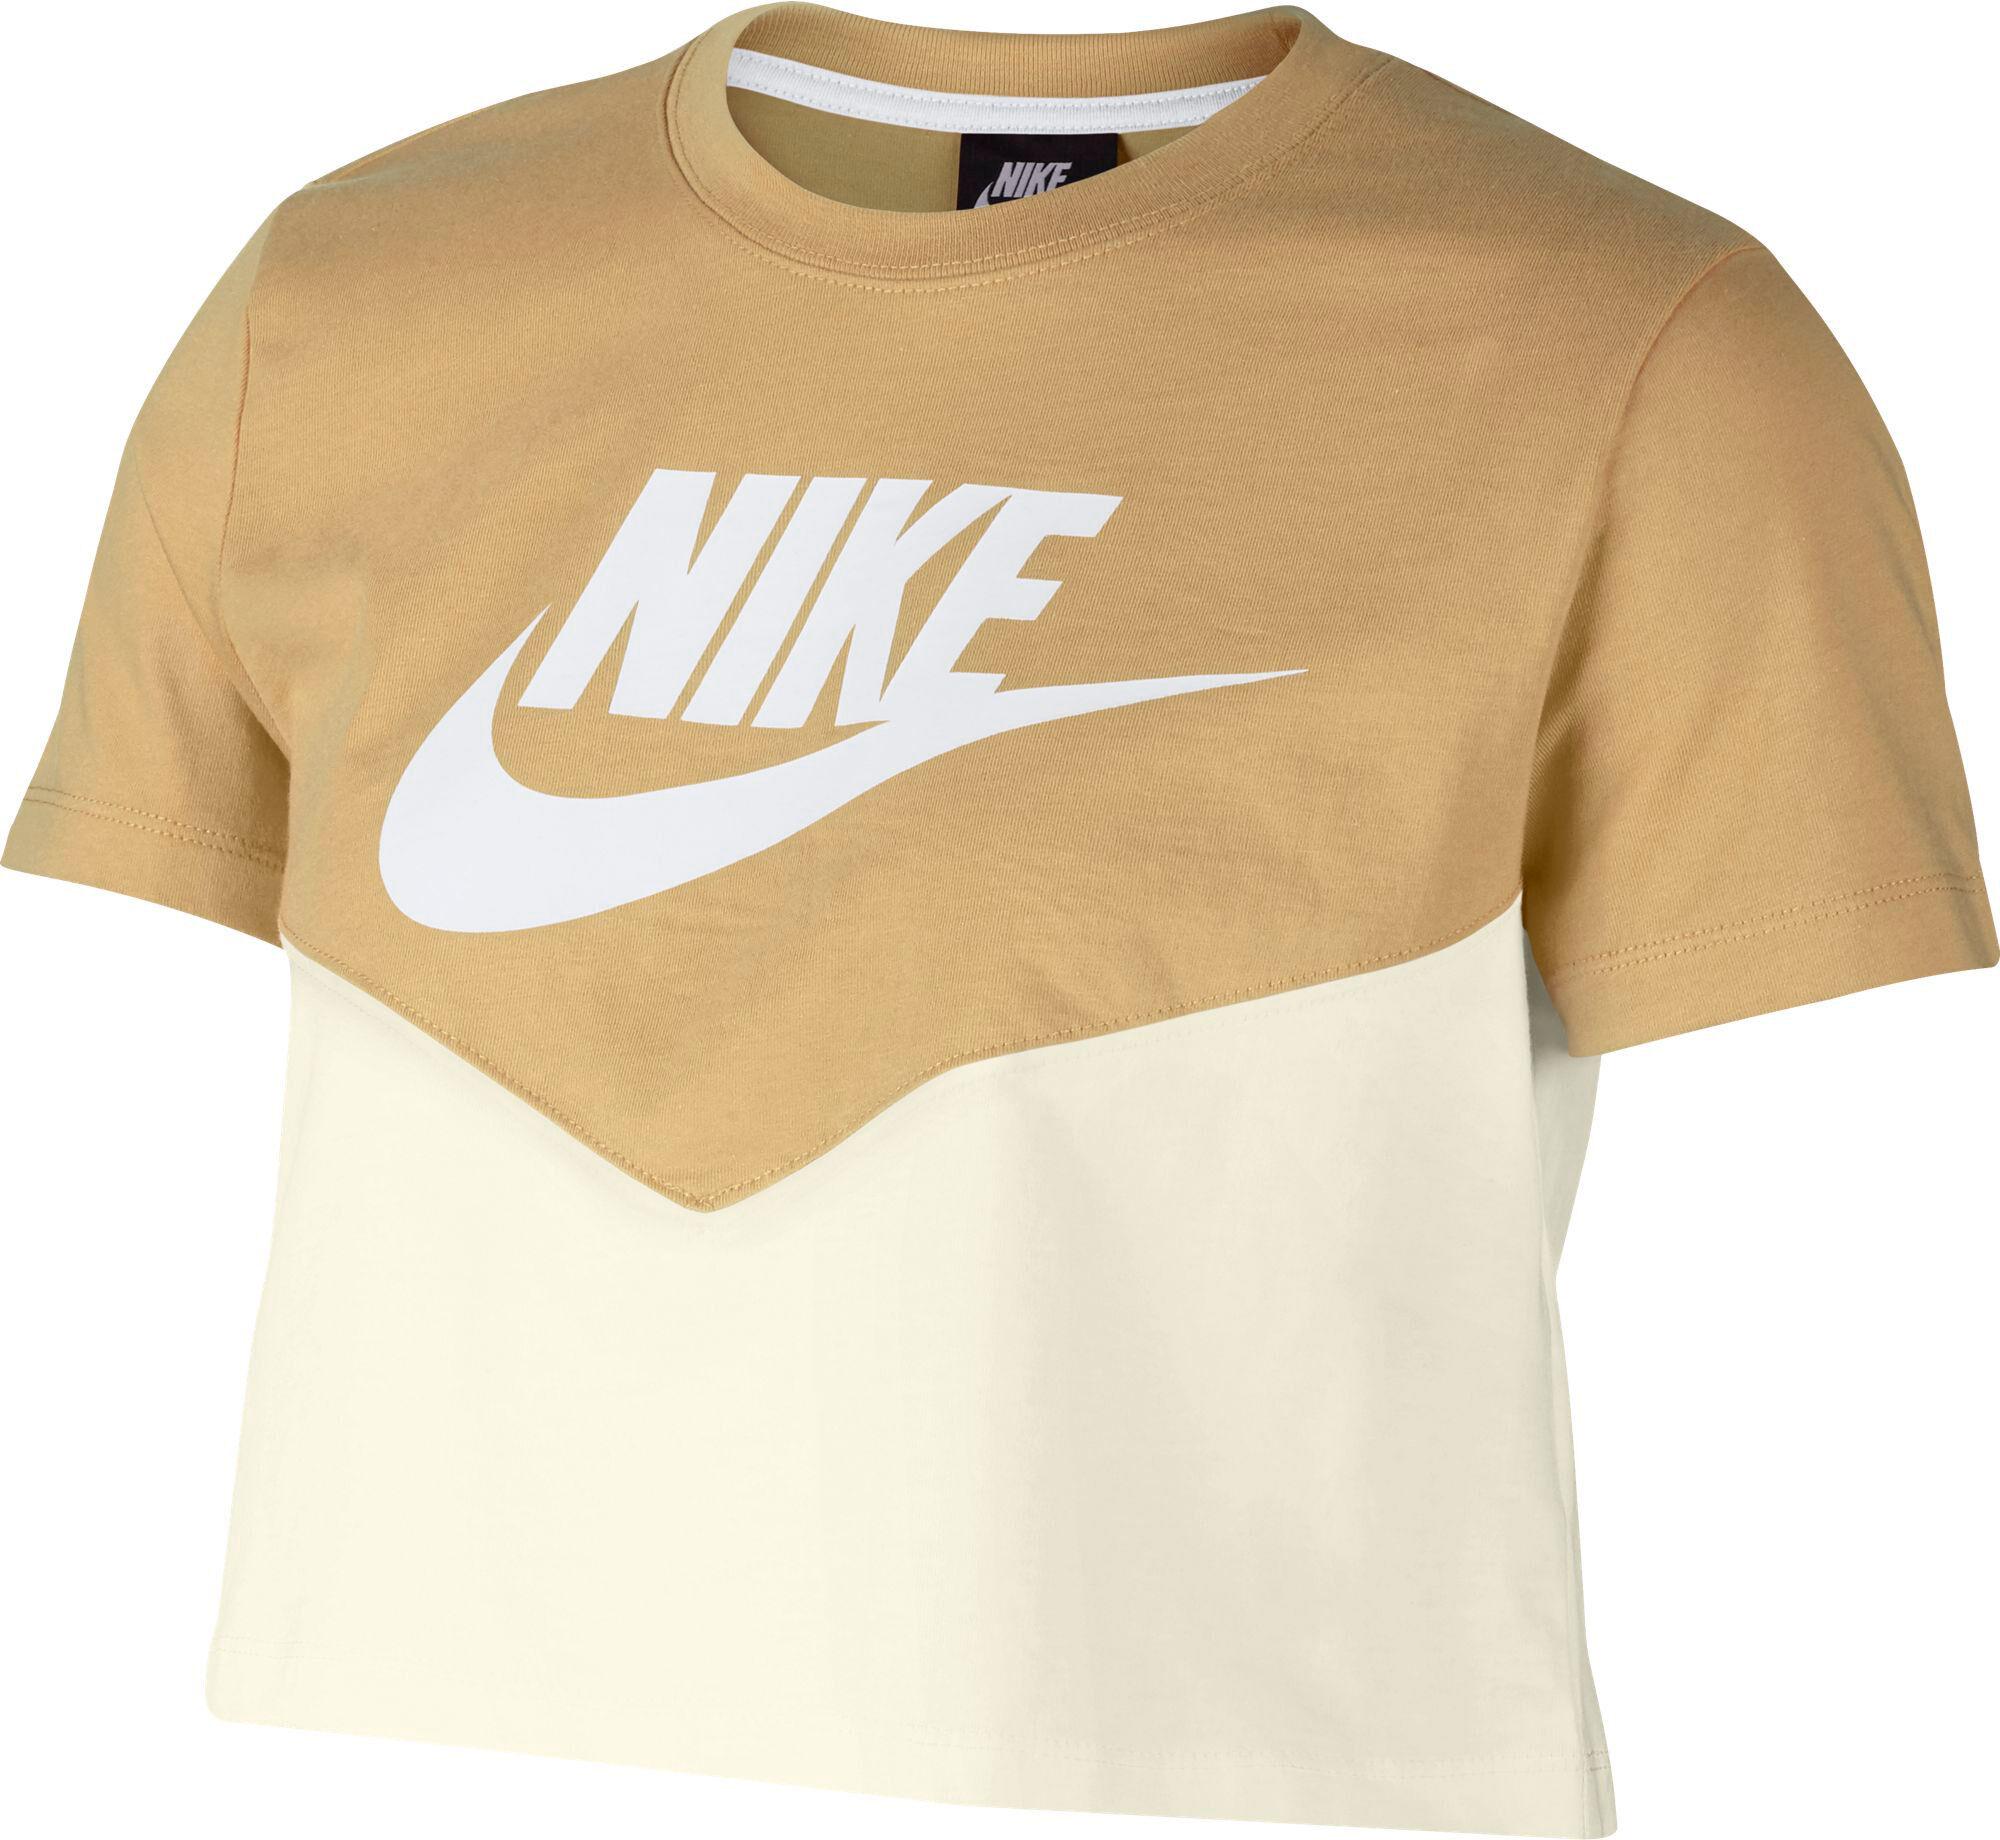 Dames Nike ShirtsIntersport ShirtsIntersport ShirtsIntersport Dames Nike Dames Nike Nike LpSUGqVzM